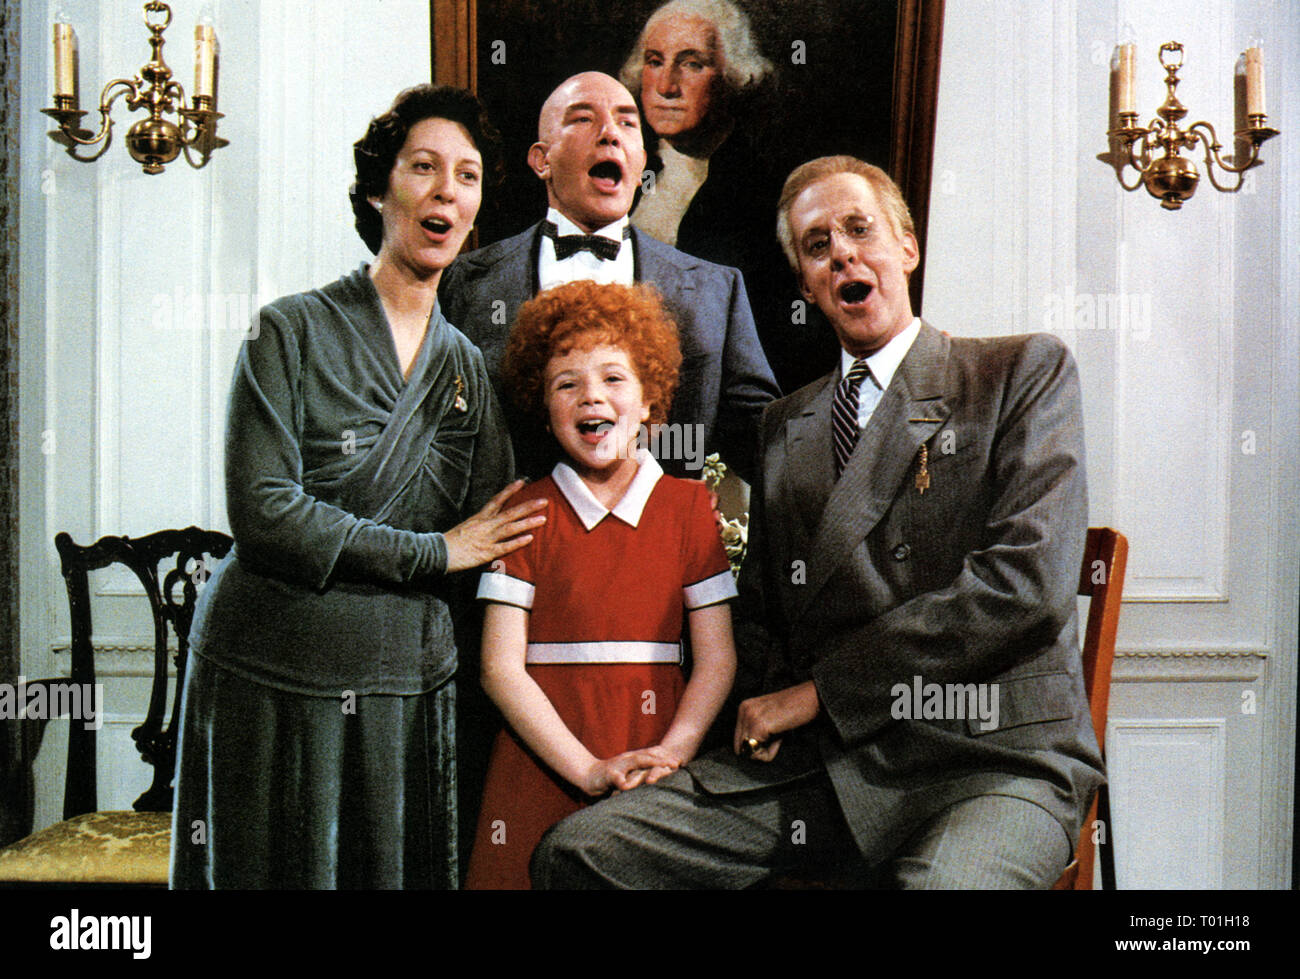 ANNIE, ANN REINKING, AILEEN QUINN, ALBERT FINNEY , EDWARD HERRMANN, 1982 - Stock Image